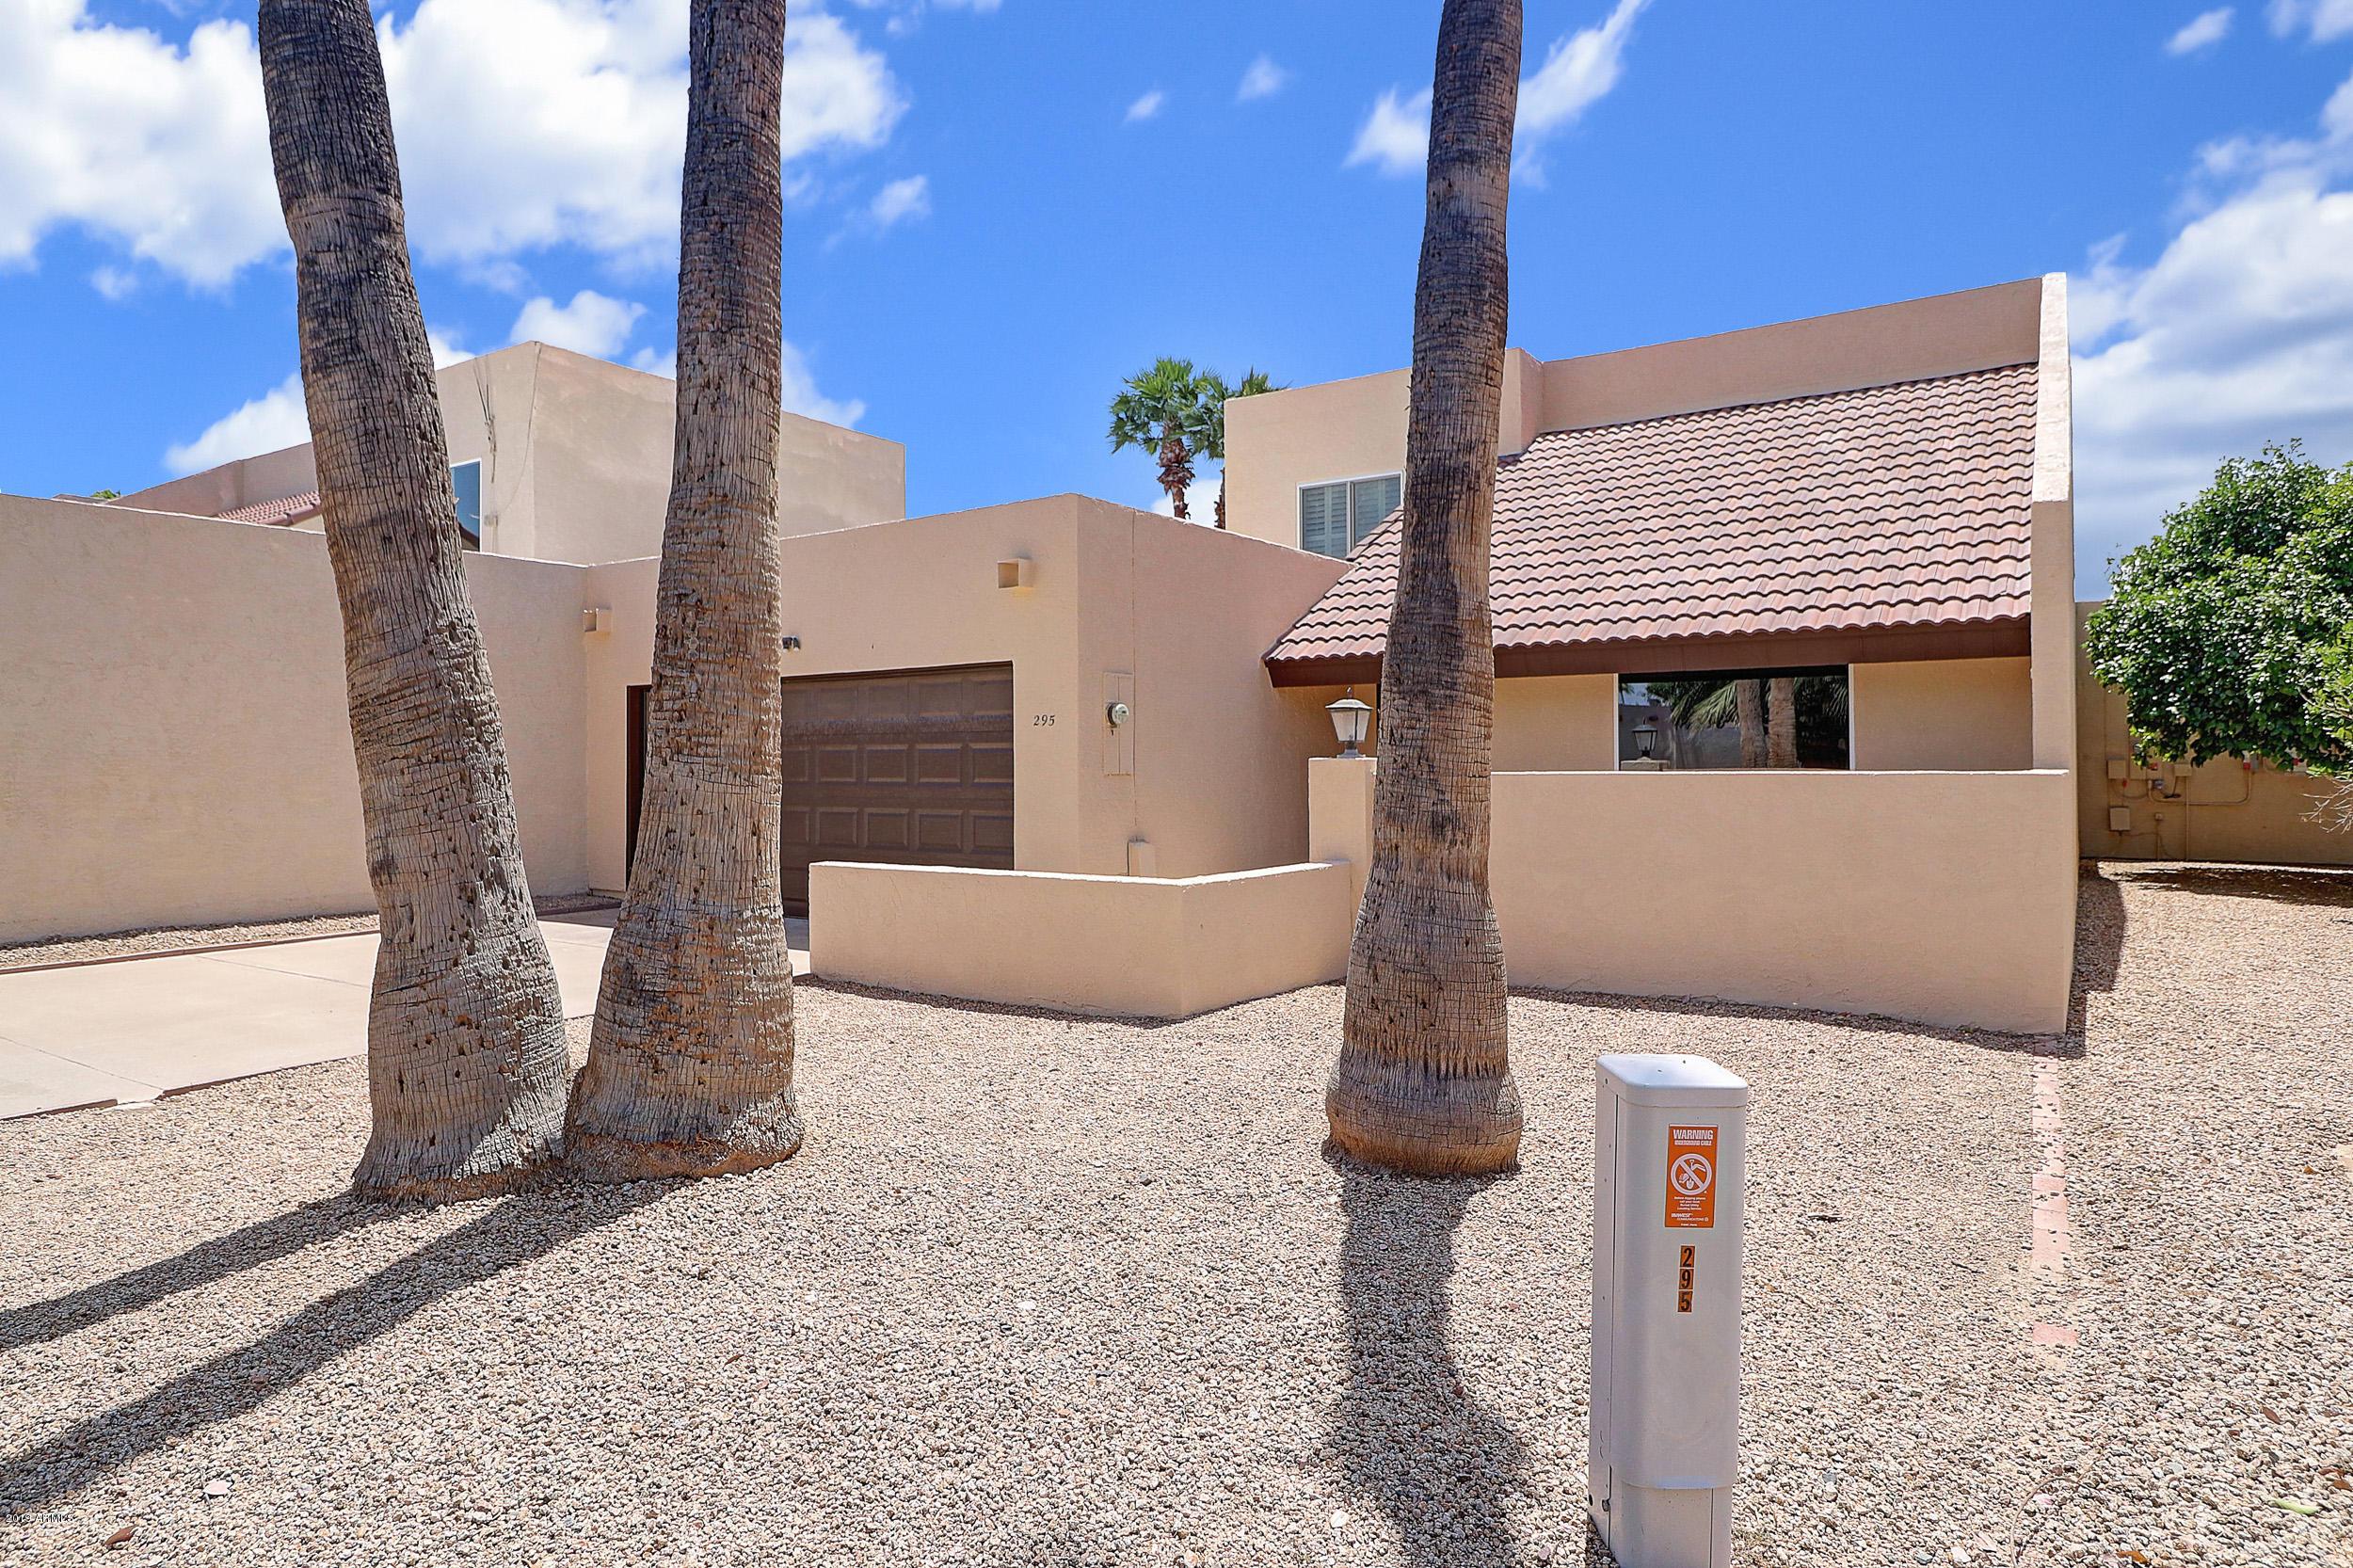 Photo of 295 S DESERT Avenue, Litchfield Park, AZ 85340